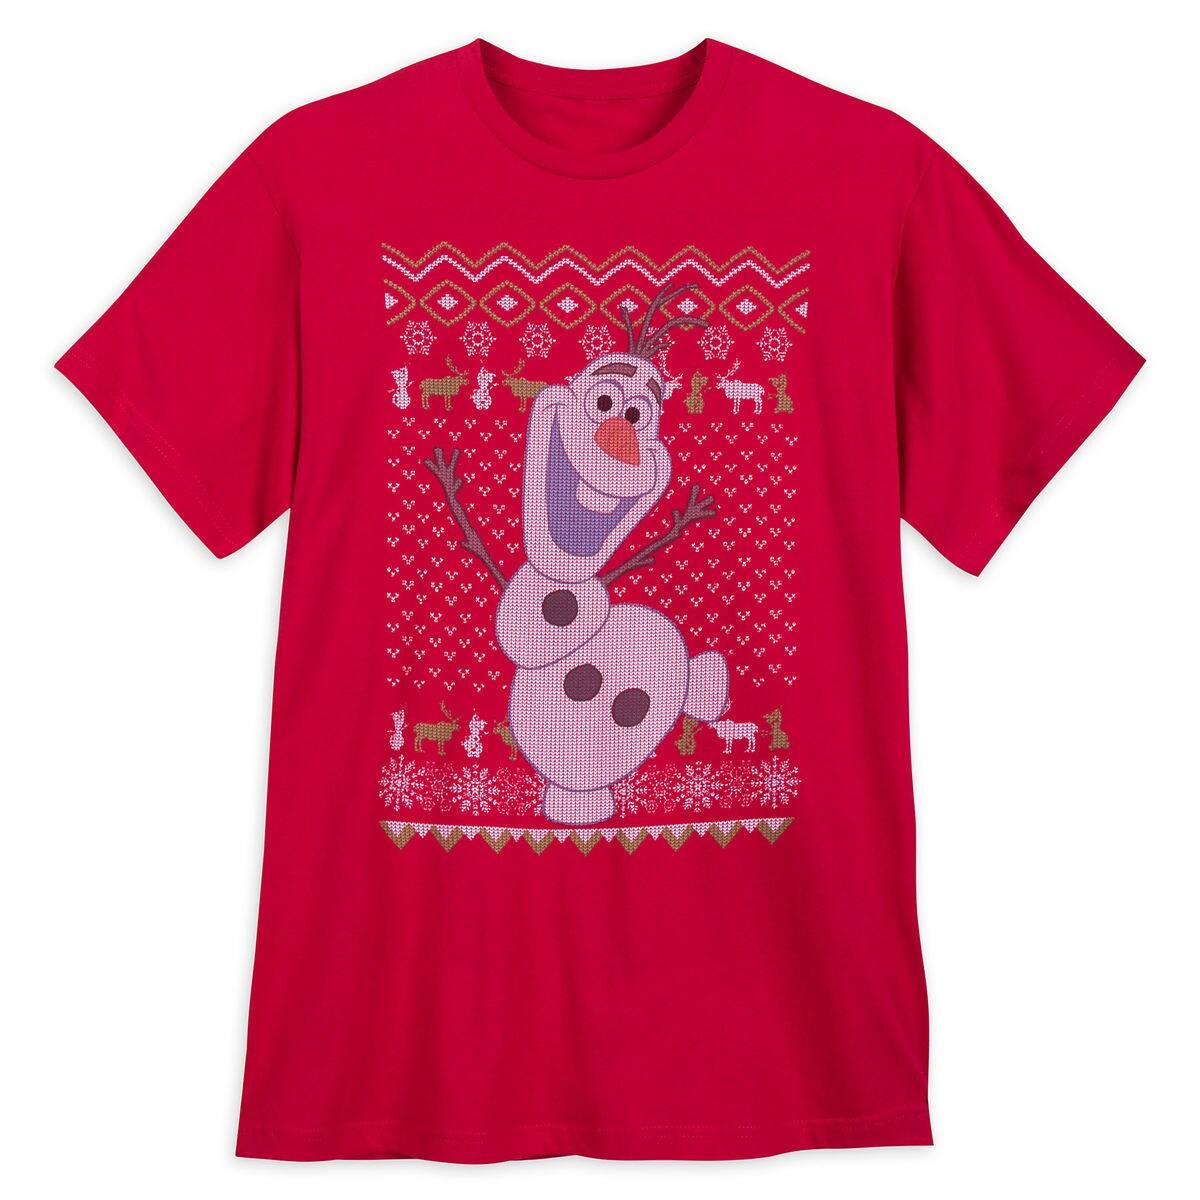 Olaf Holiday T-Shirt for Men - Frozen | shopDisney